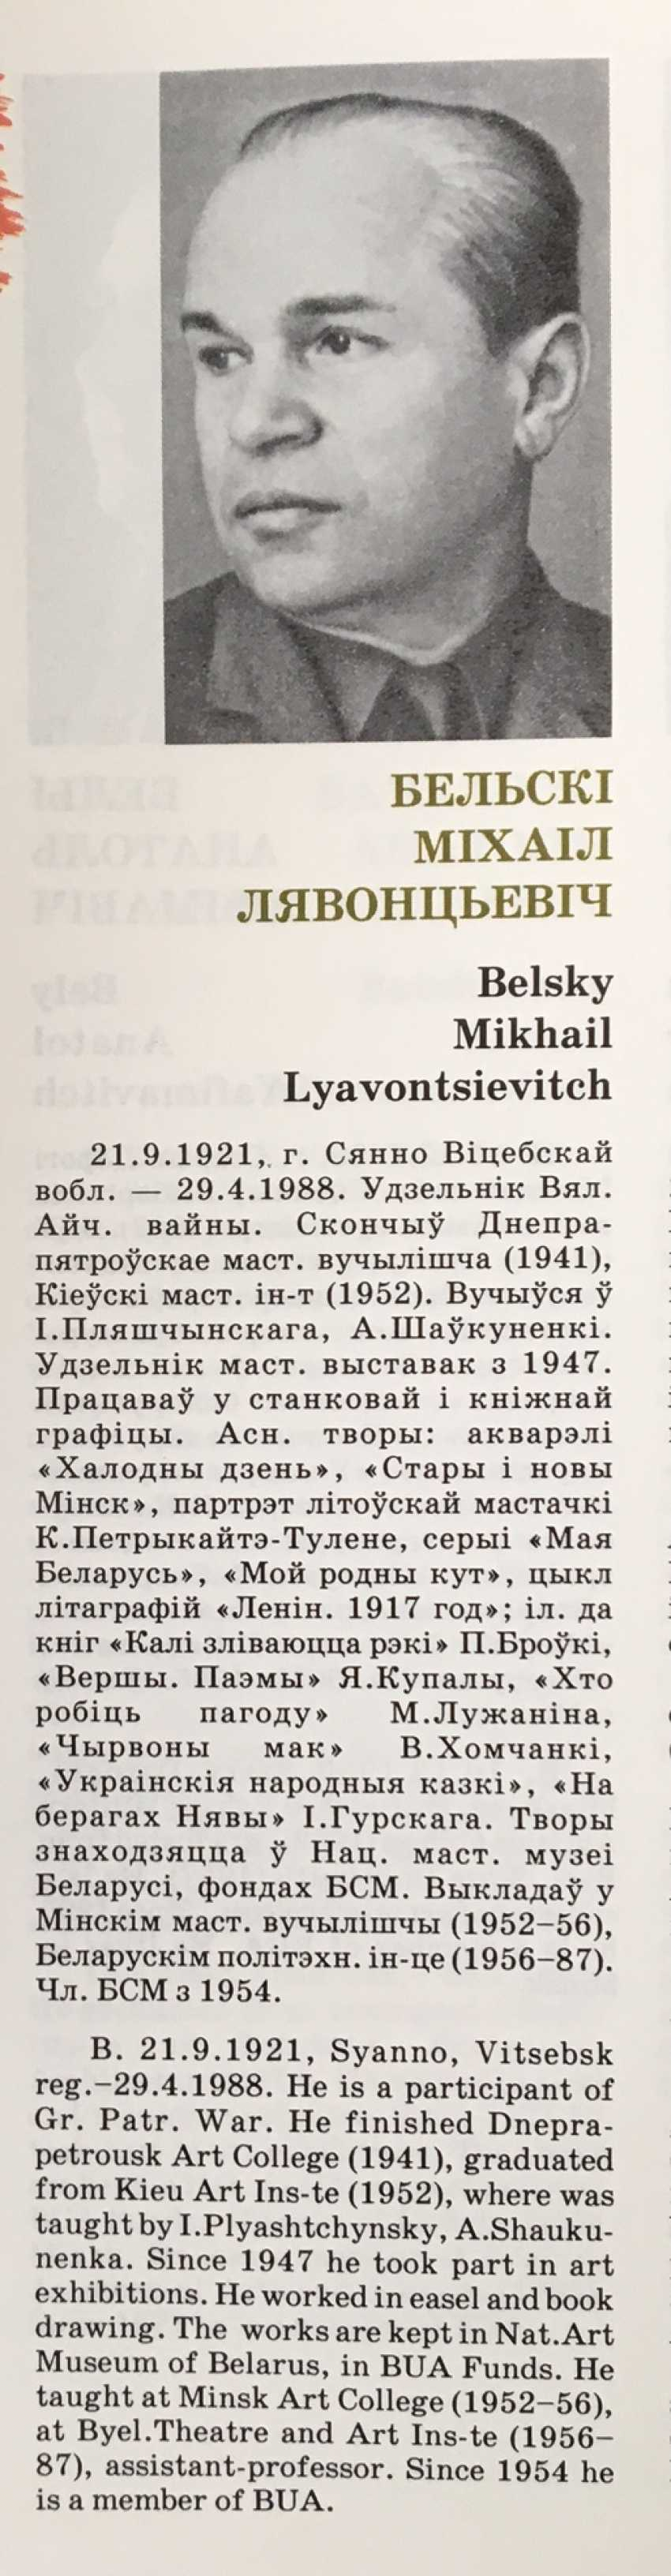 Belsky M. L. Painting, 1967 - photo 5